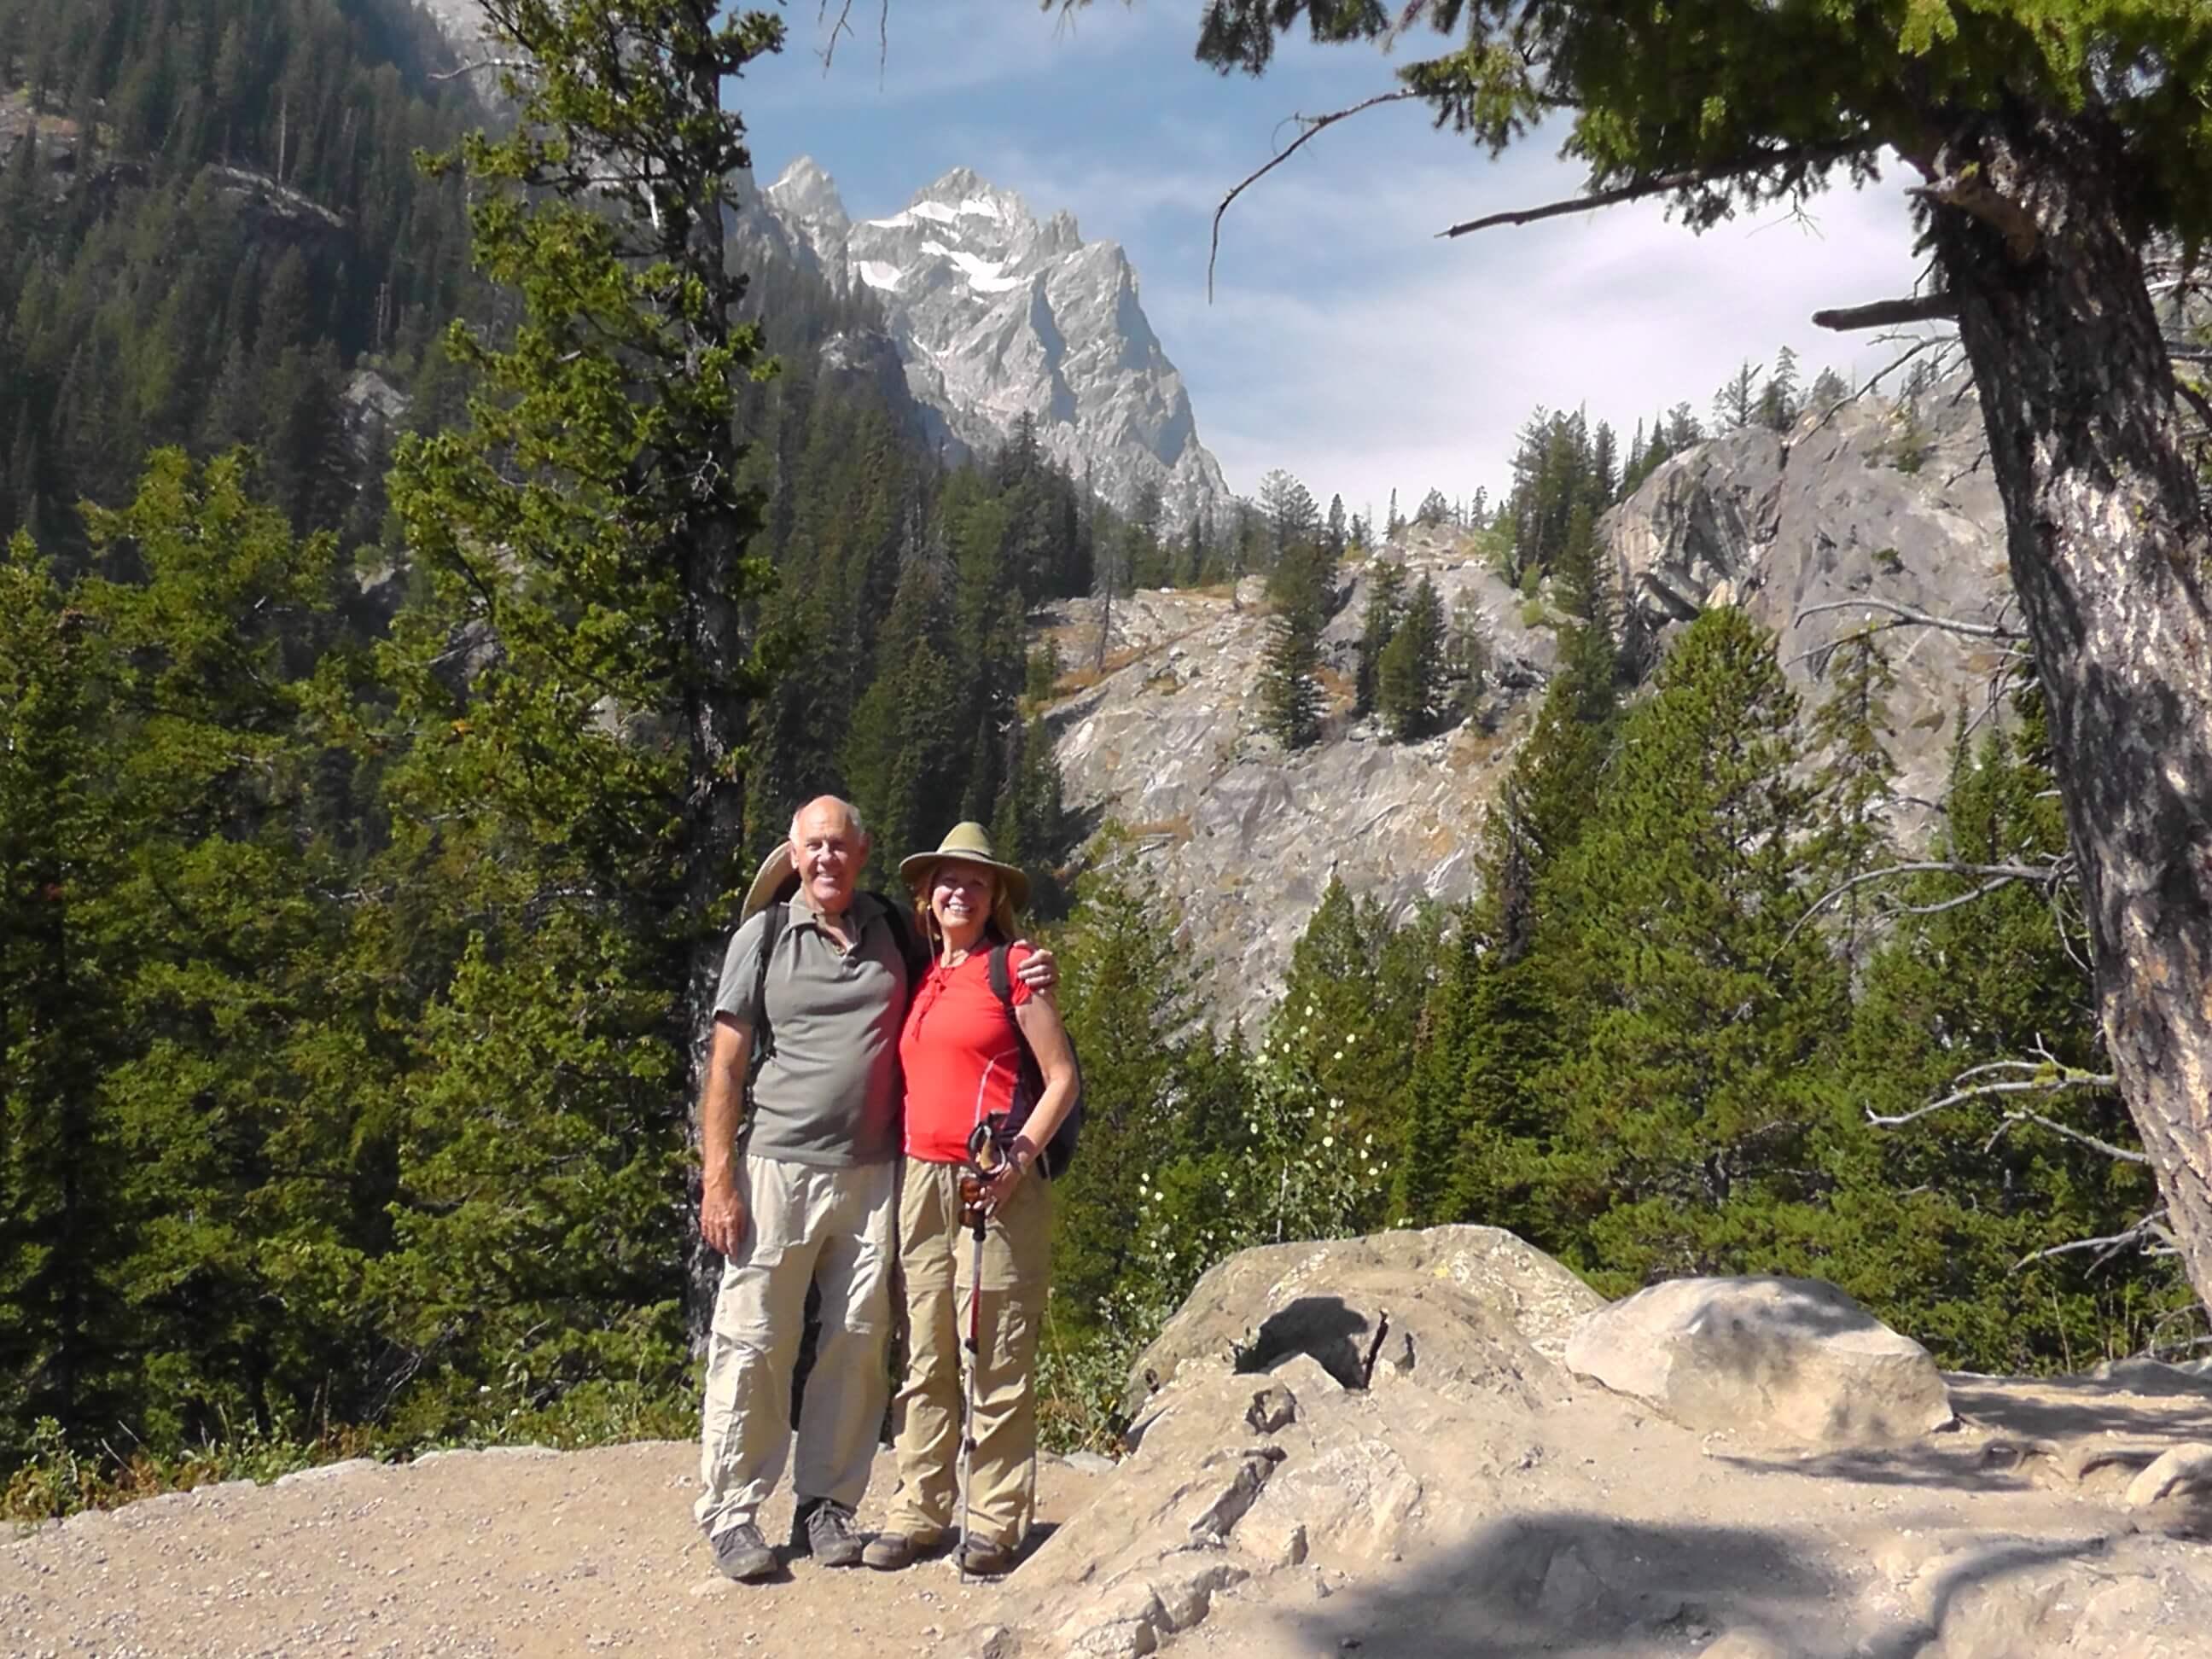 Near Inspiration Point, Grand Teton National Park, Wyoming